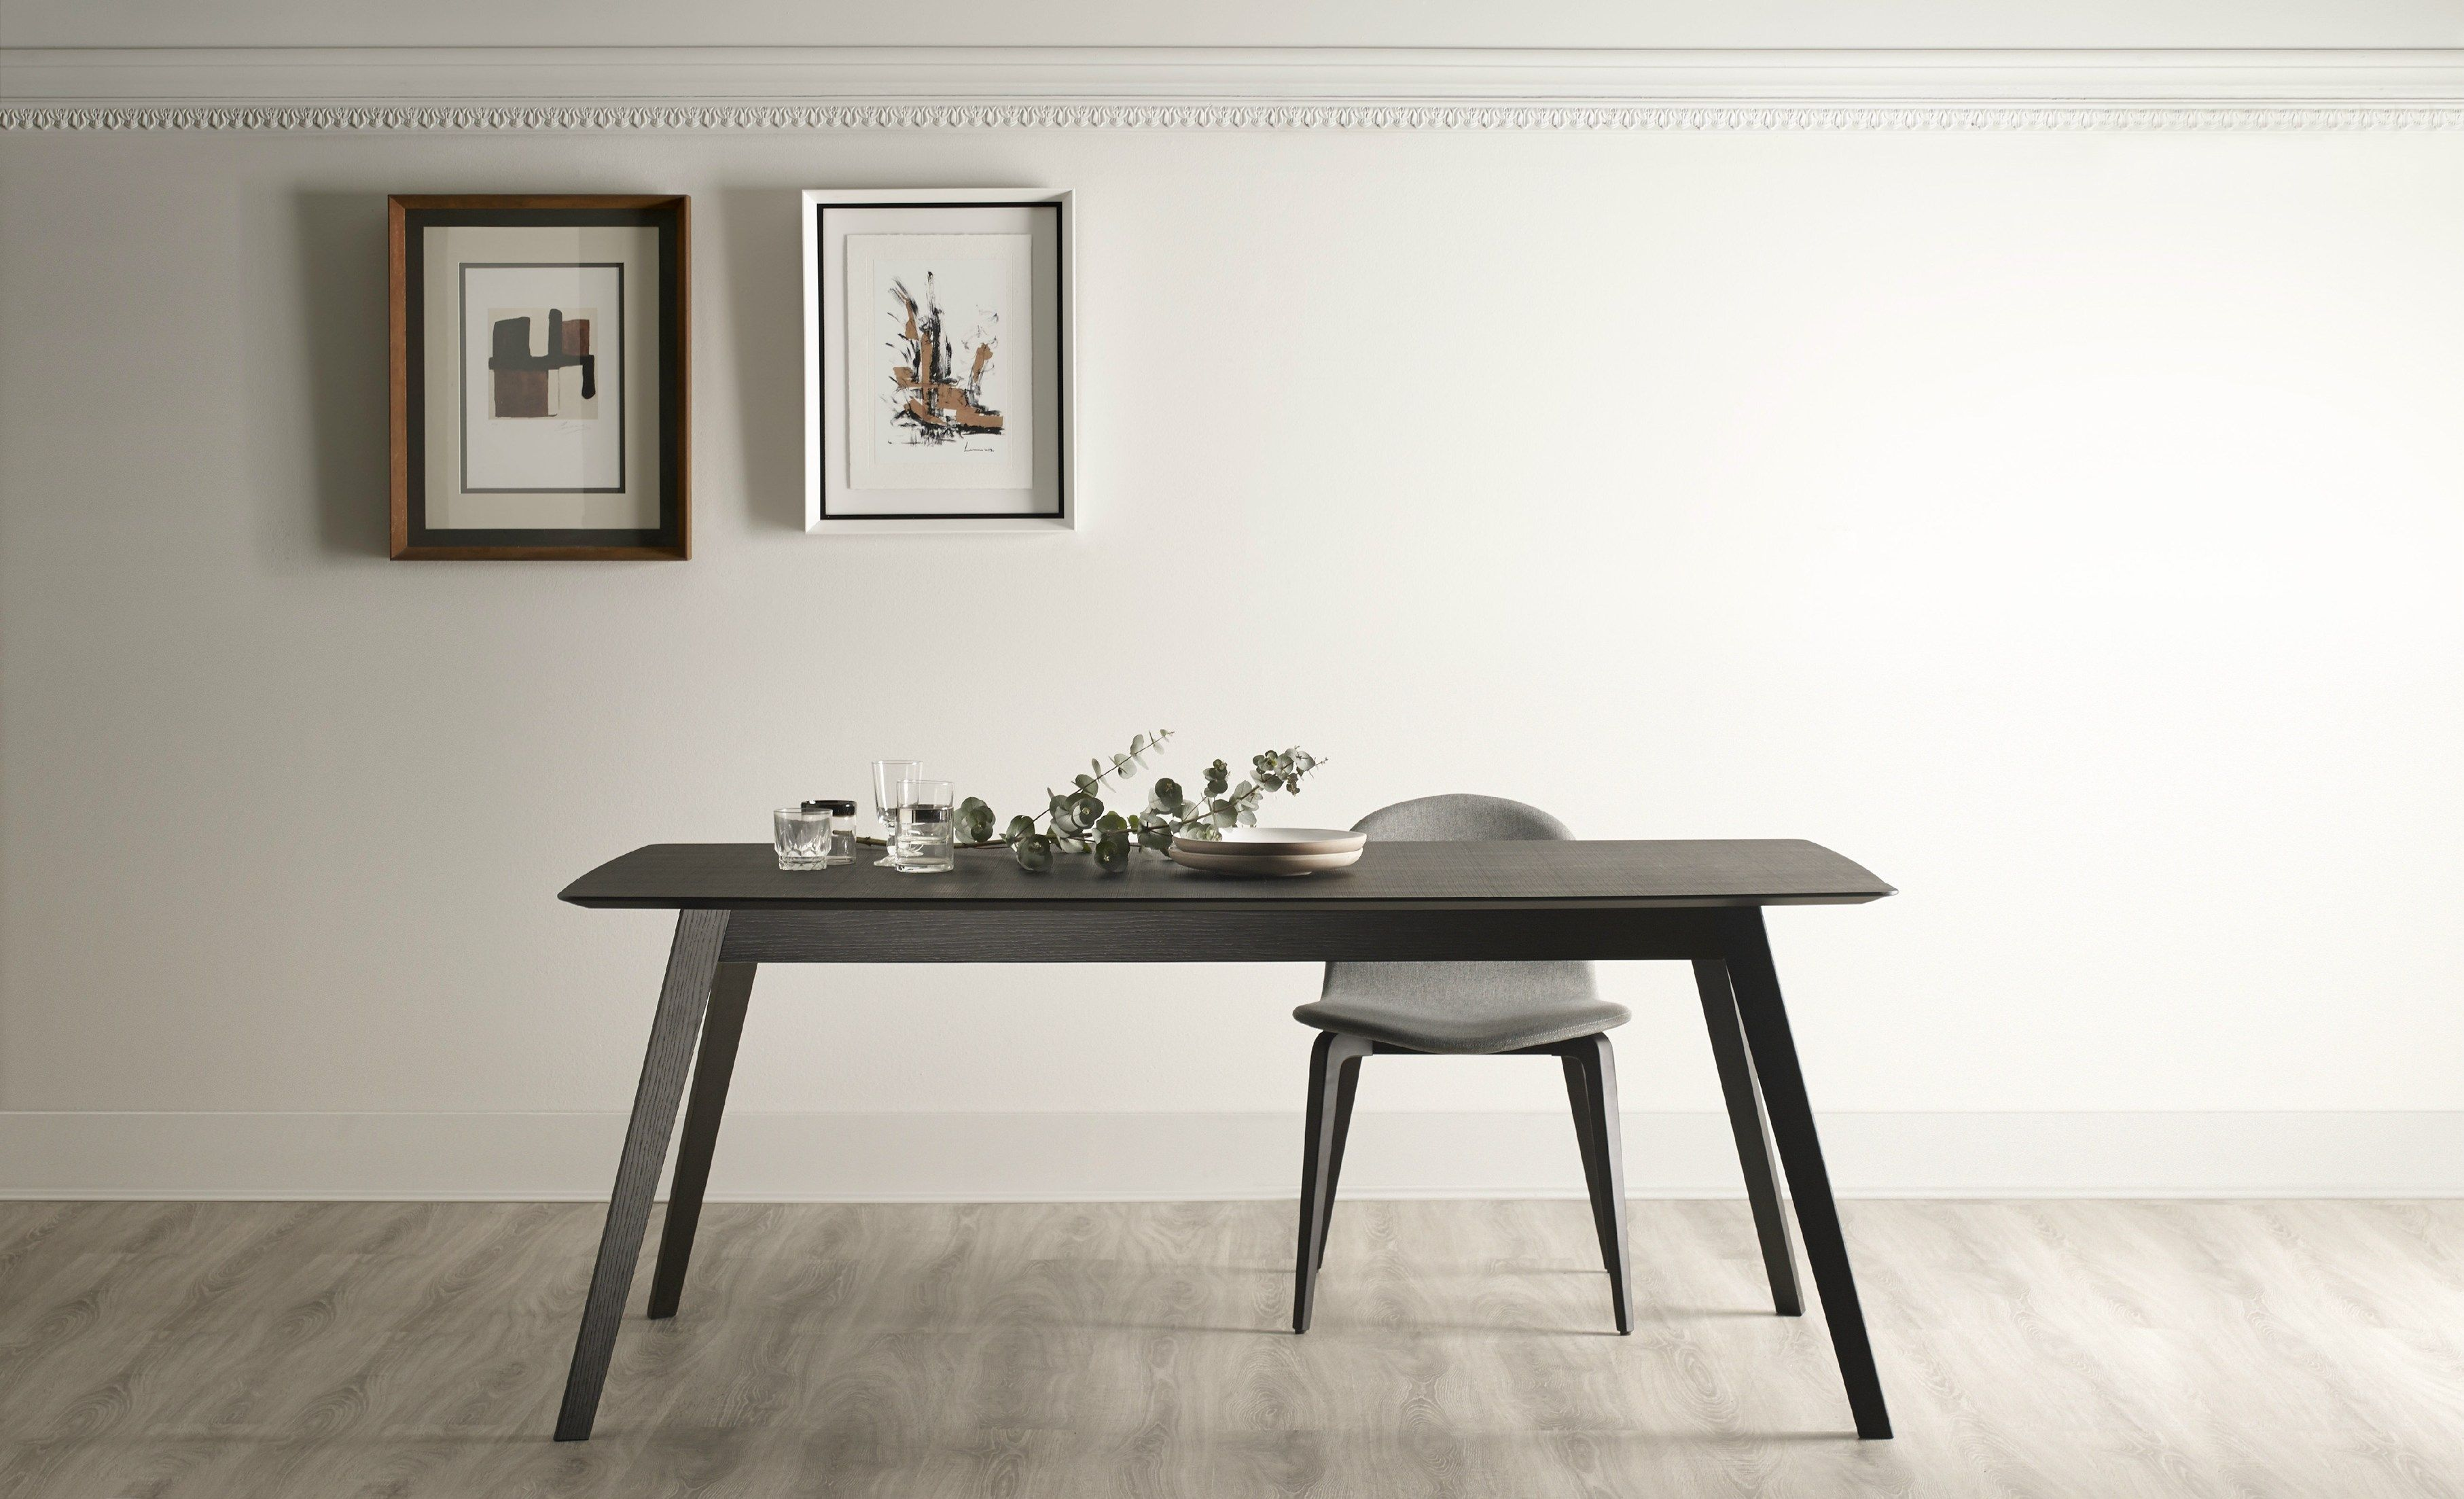 Tisch design  AISE Ausziehbarer Tisch by TREKU Design Ibon Arrizabalaga ...